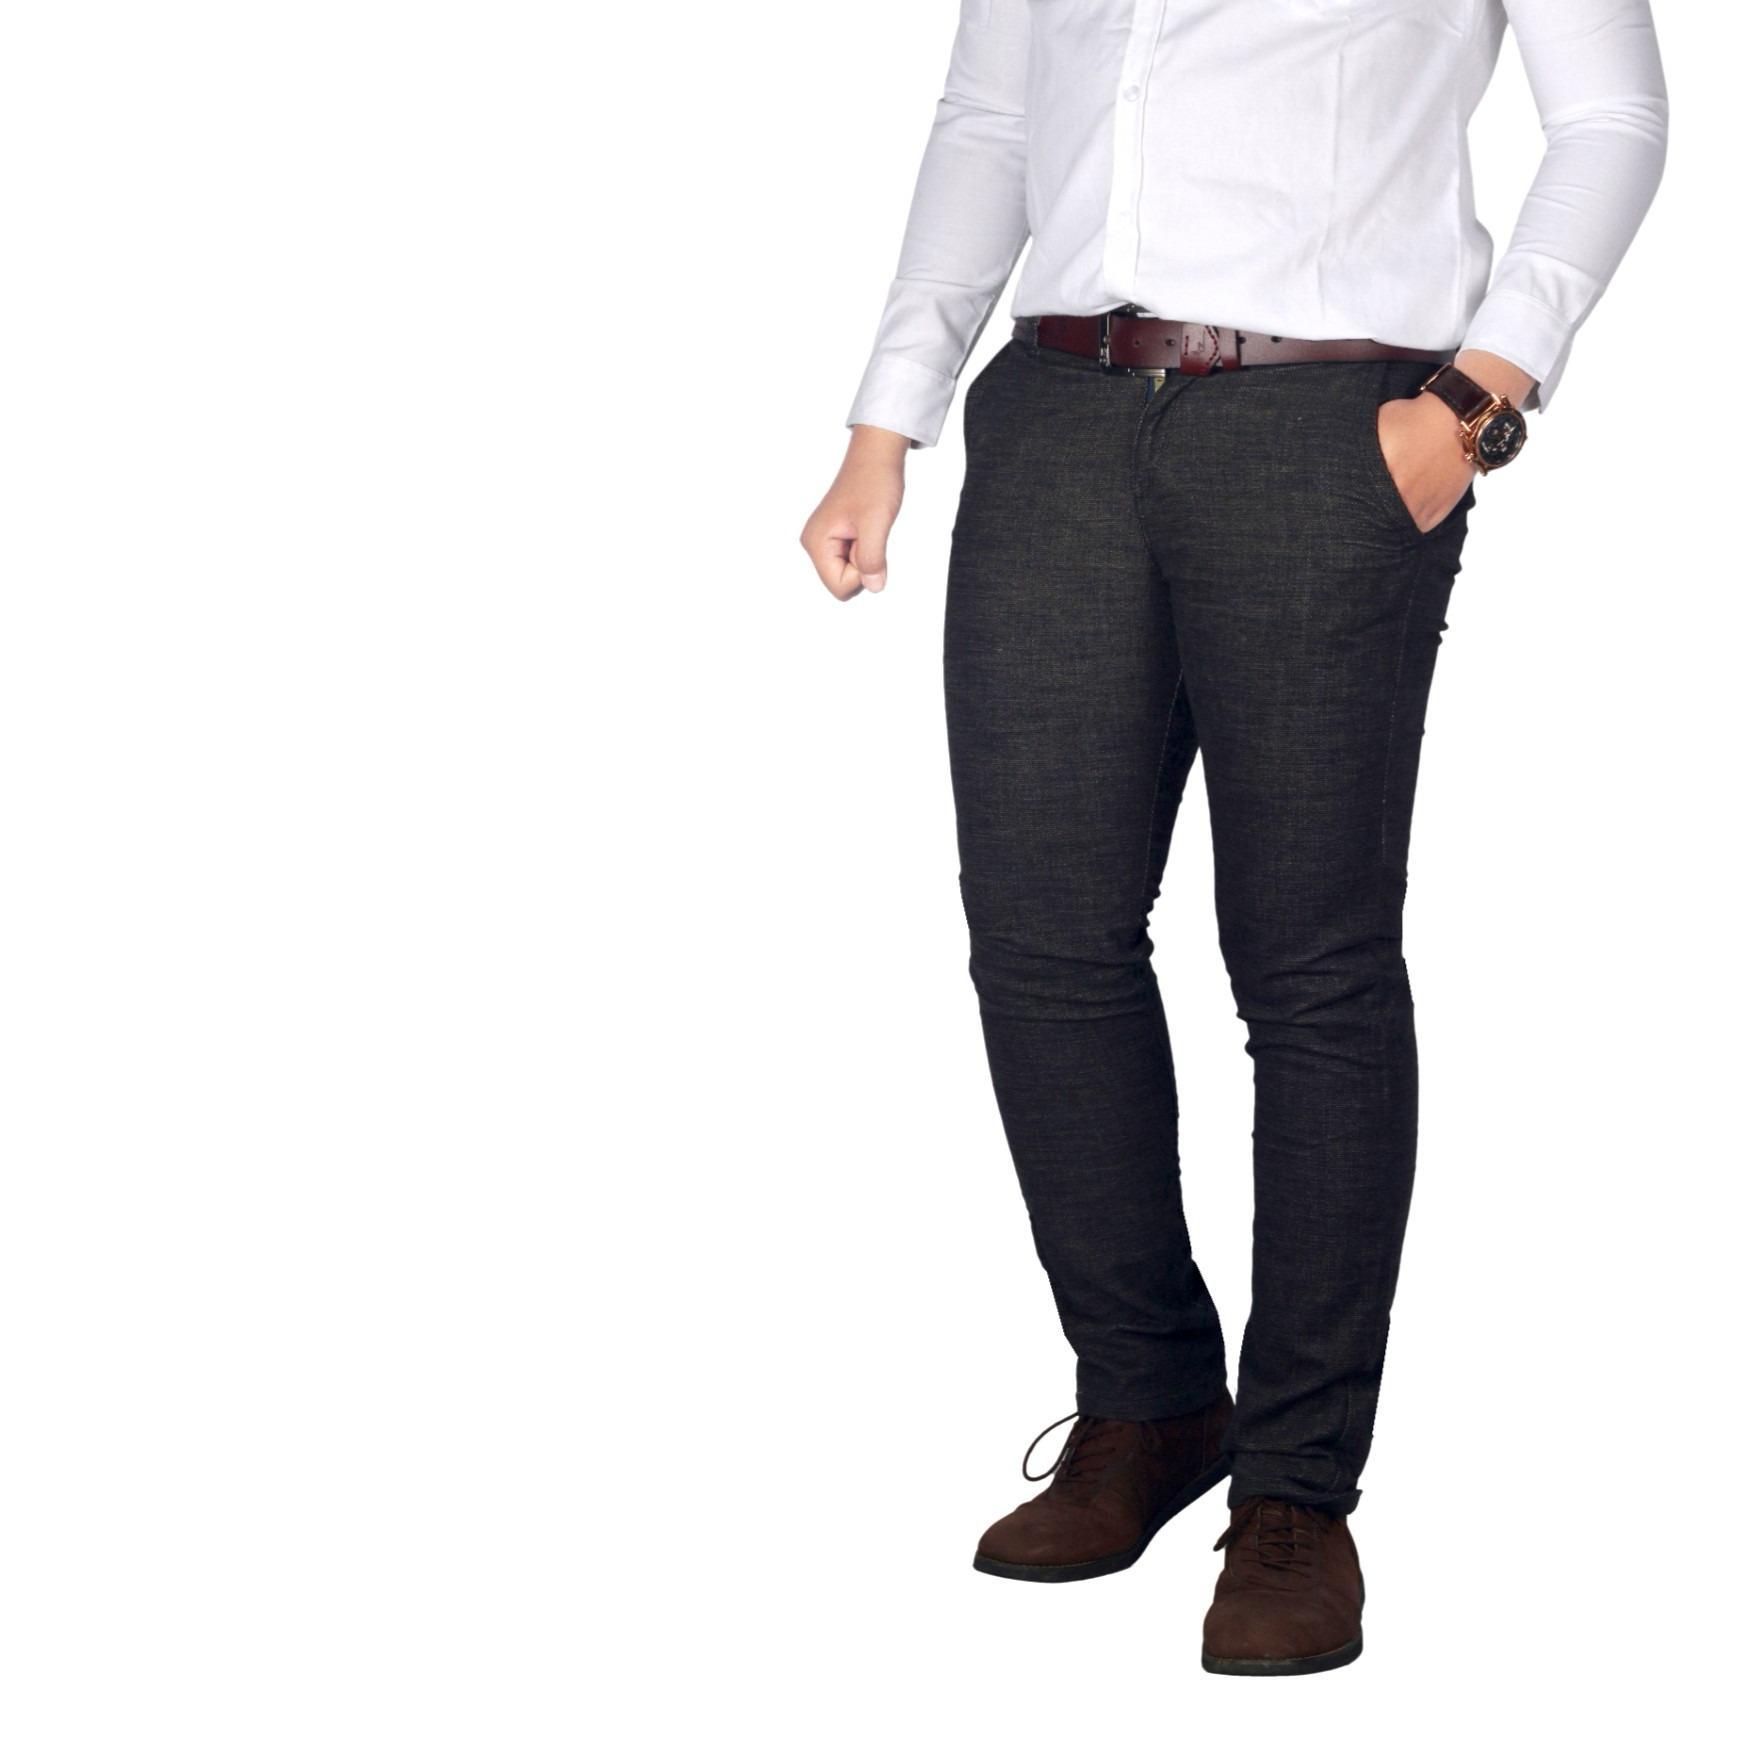 Iklan Dgm Fashion1 Celana Chinos Import Hitam Cucian Panjang Celana Panjang Chinos Celana Chino Import Celana Panjang Celana Chino Pria Celana Casual Celana Denim Celana Jeans Hitam Celana Chino Skinny 5532